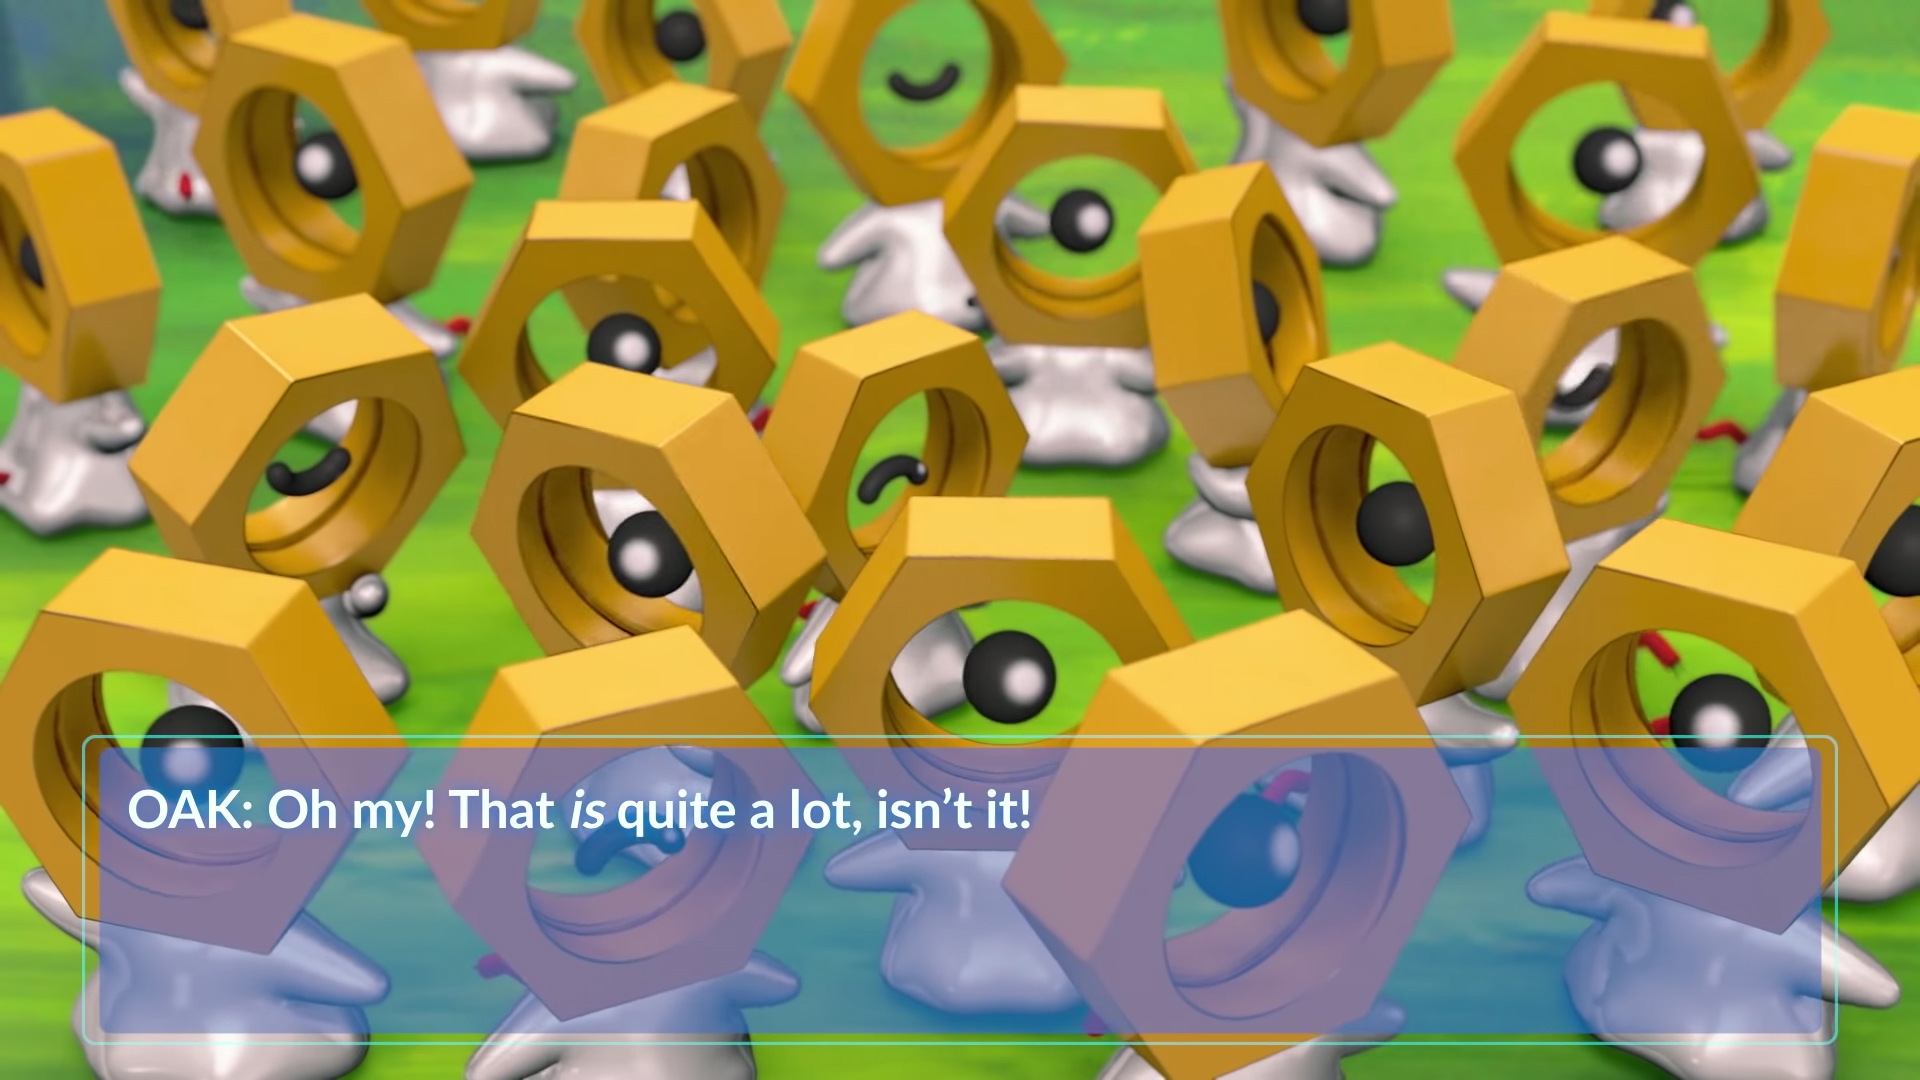 Pokemon Go has unleashed shiny Meltan screenshot